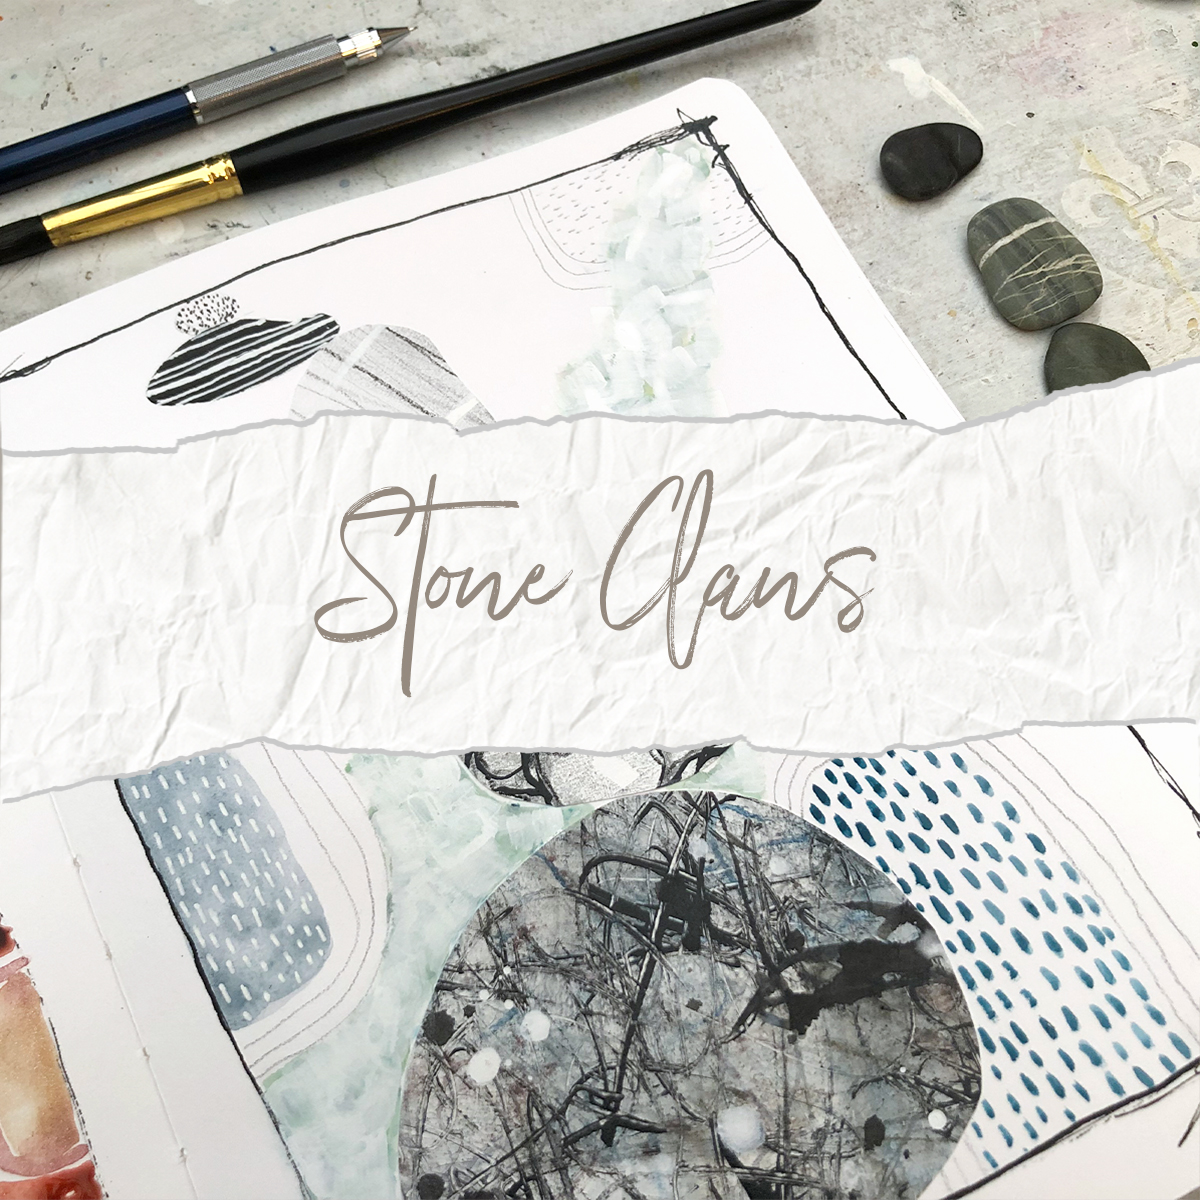 stoneclans2.jpg